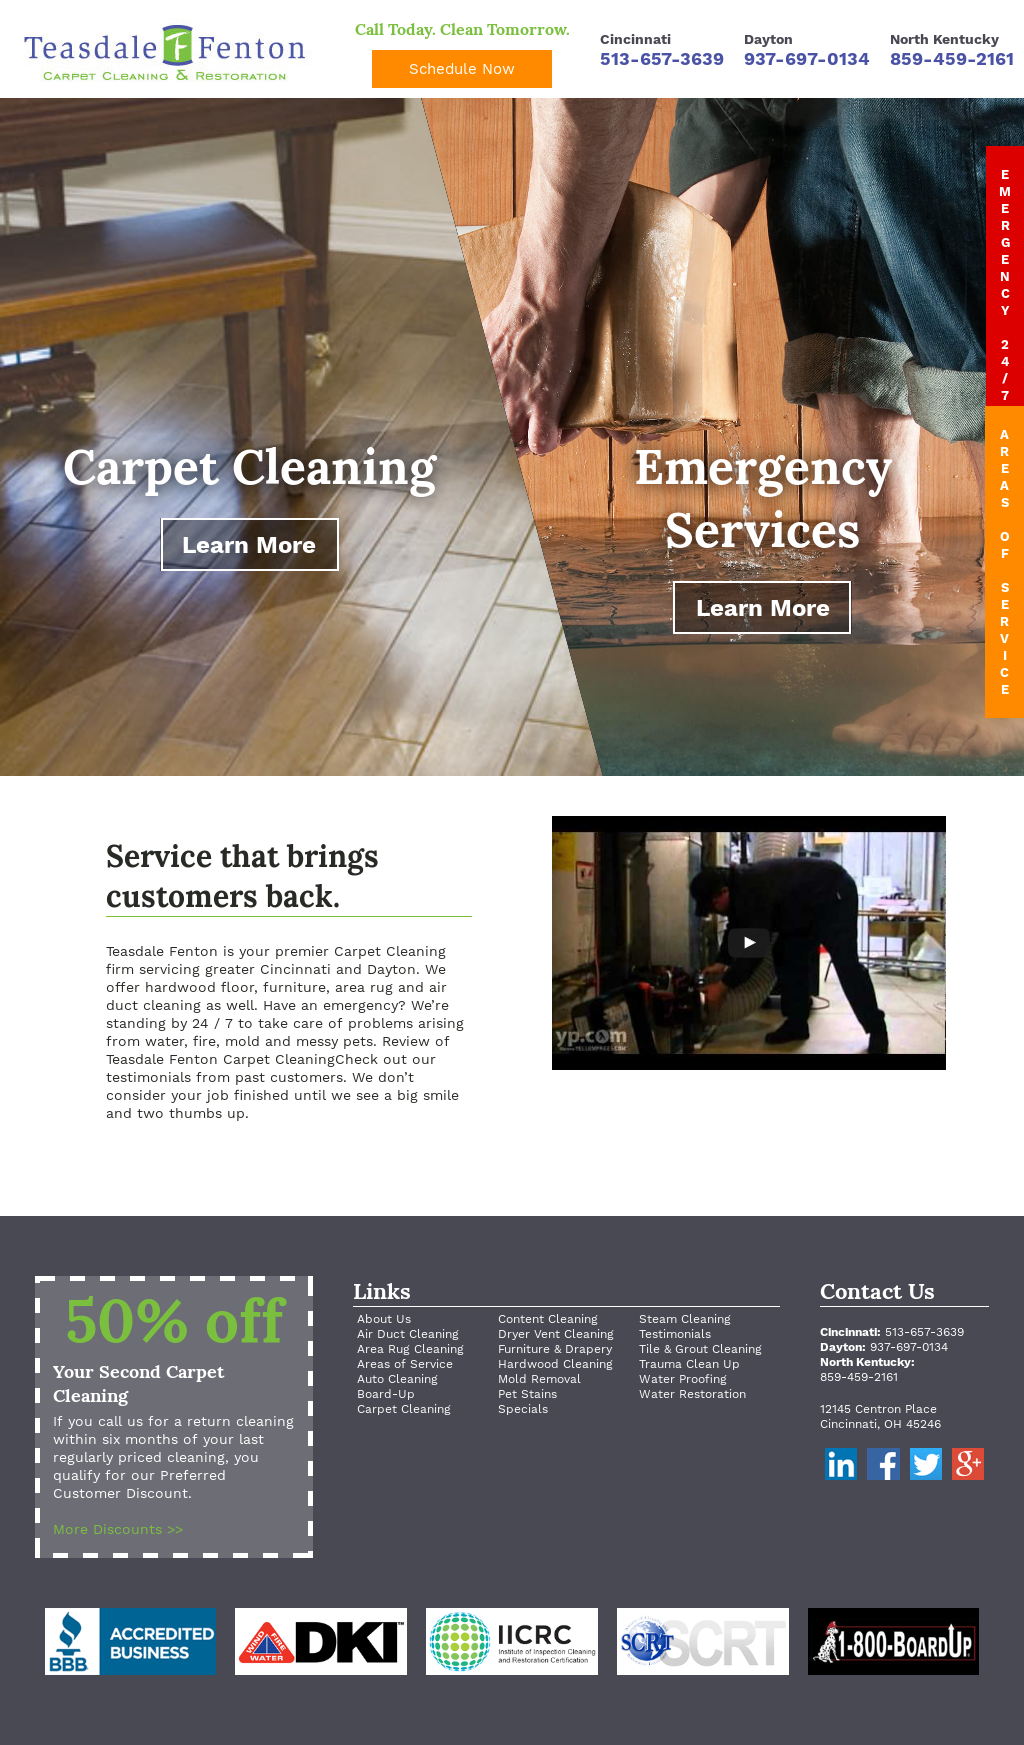 Teasdale Fenton Restoration's website screenshot on Jun 2016